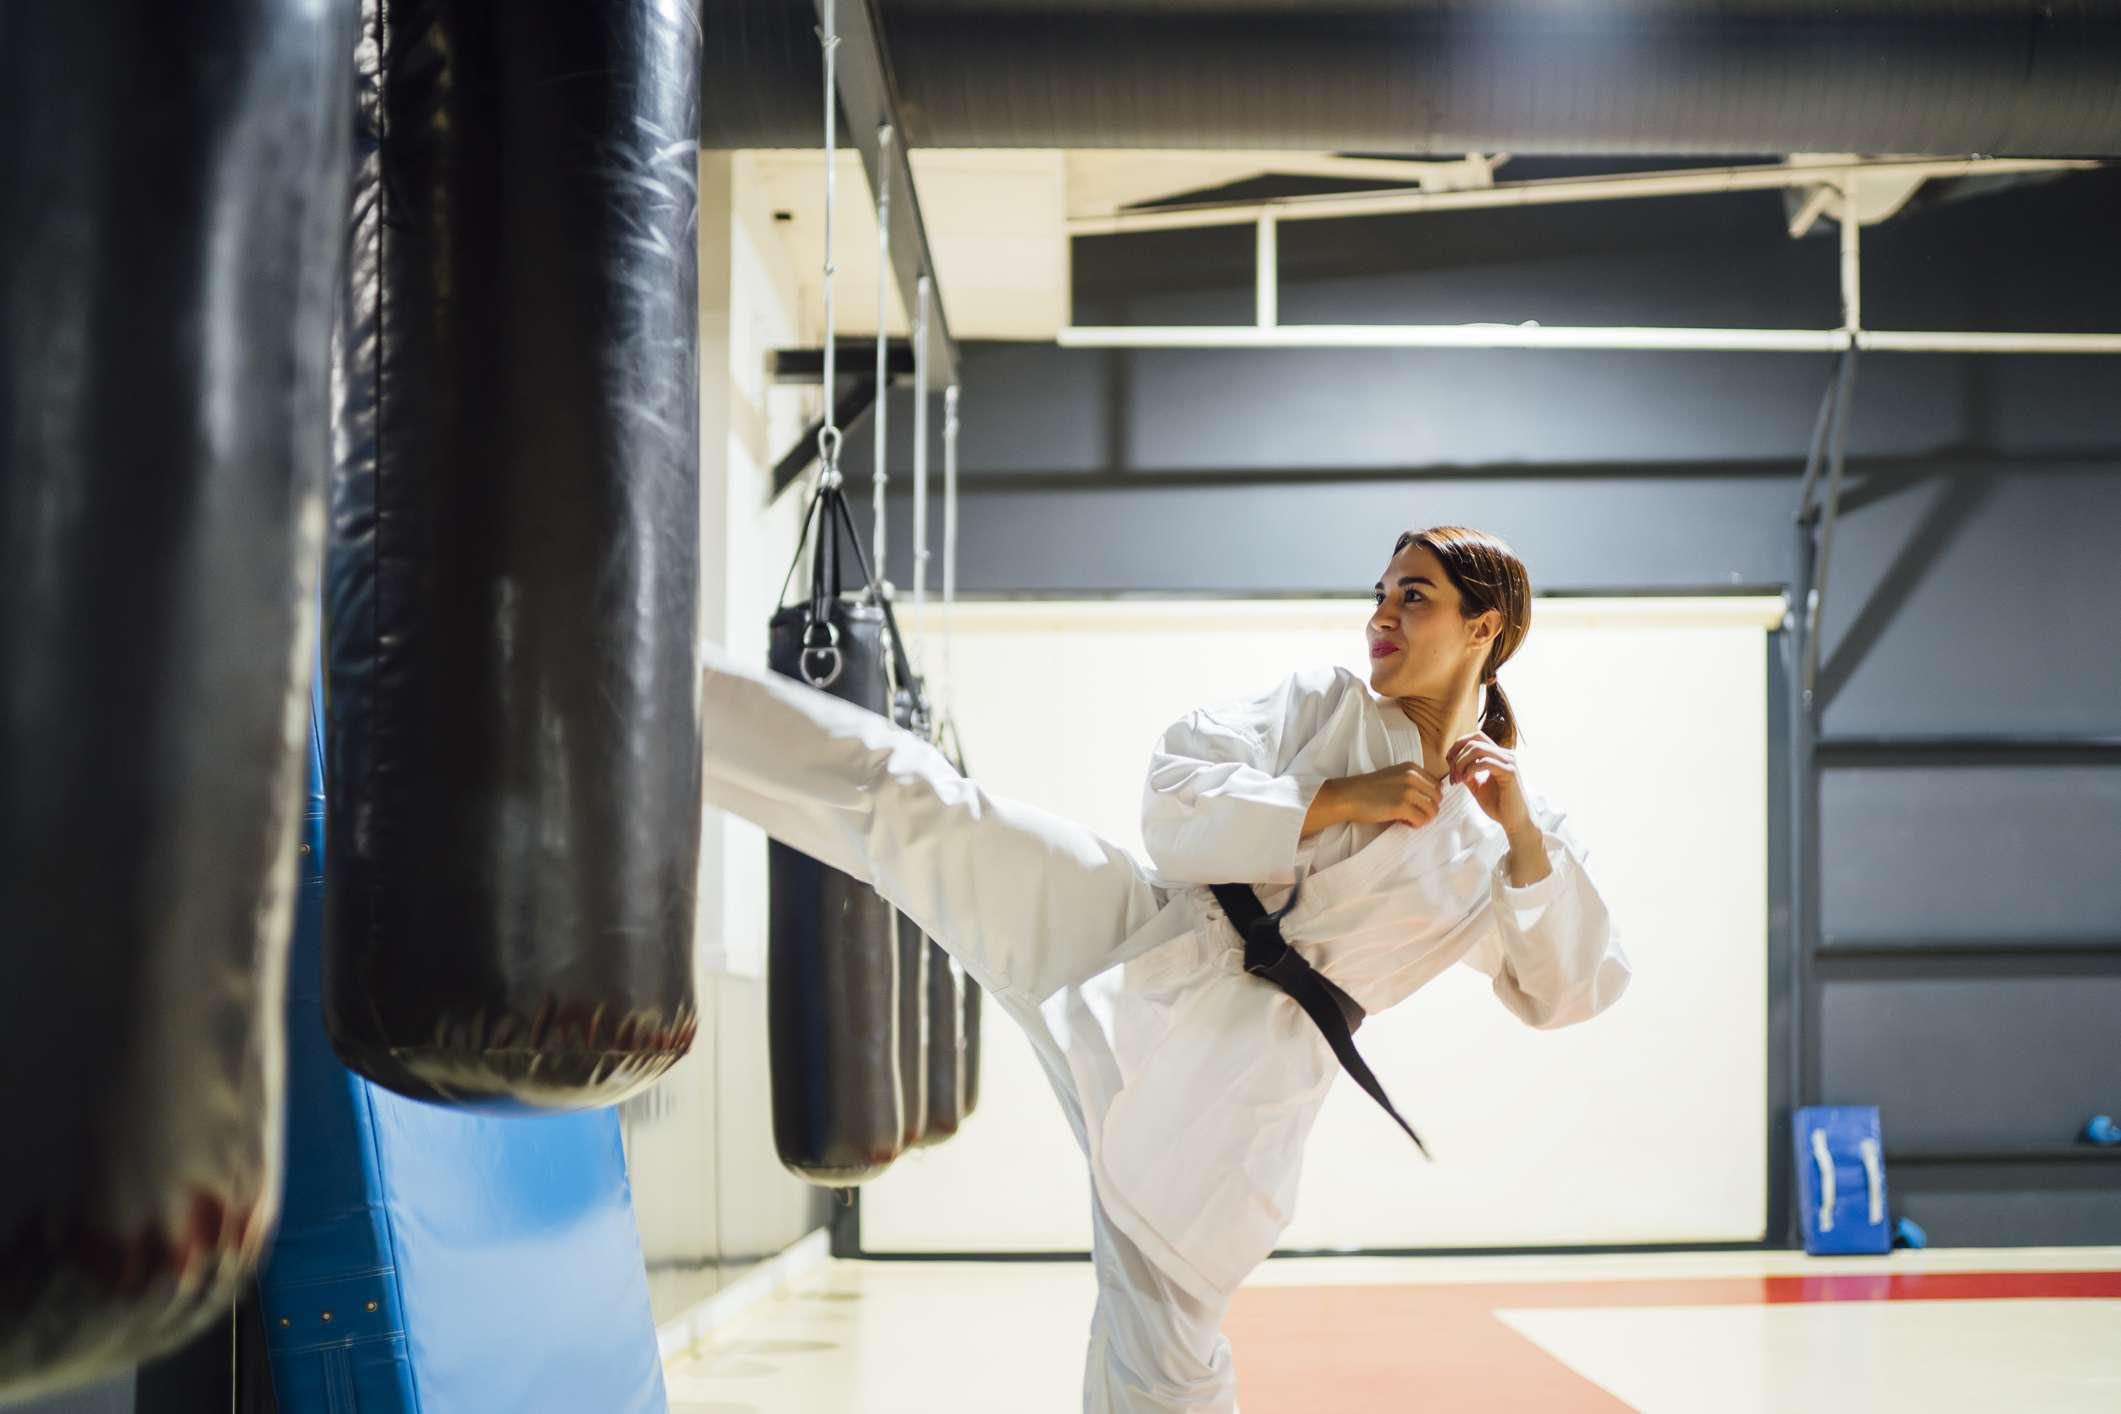 Woman practices karate